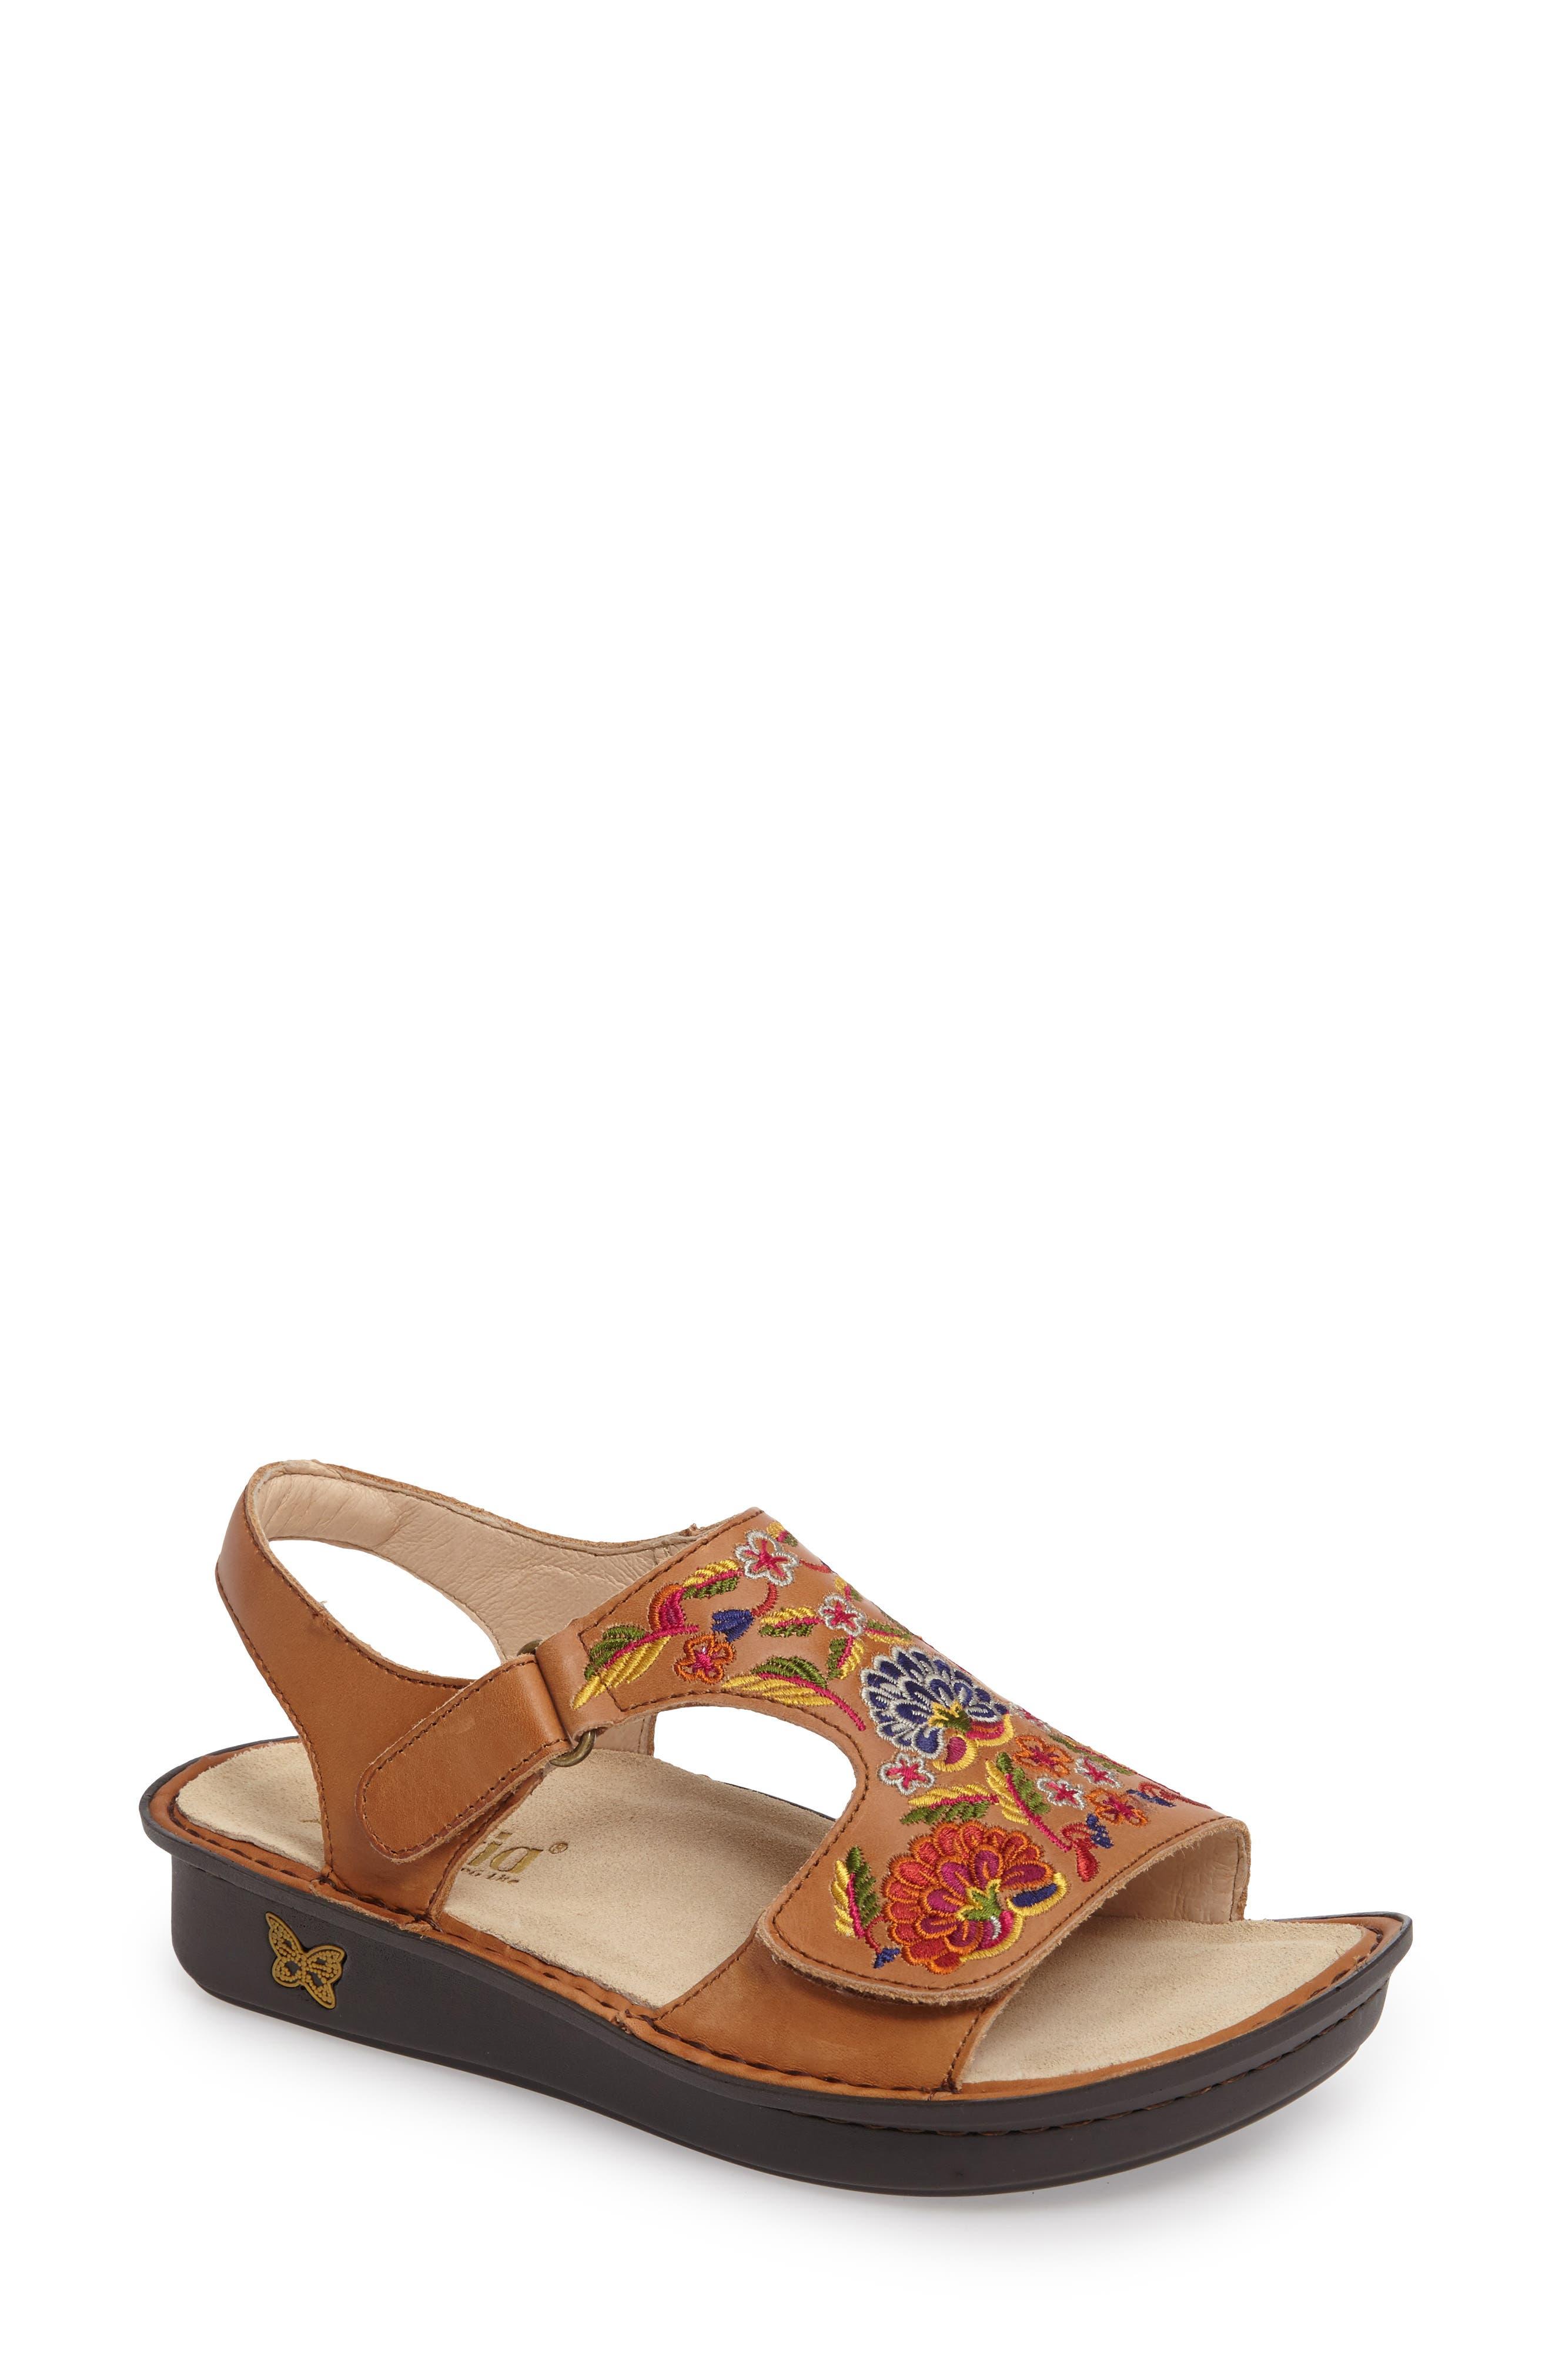 Viki Embroidered Sandal,                             Main thumbnail 1, color,                             Cognac Pins/ Needles Leather